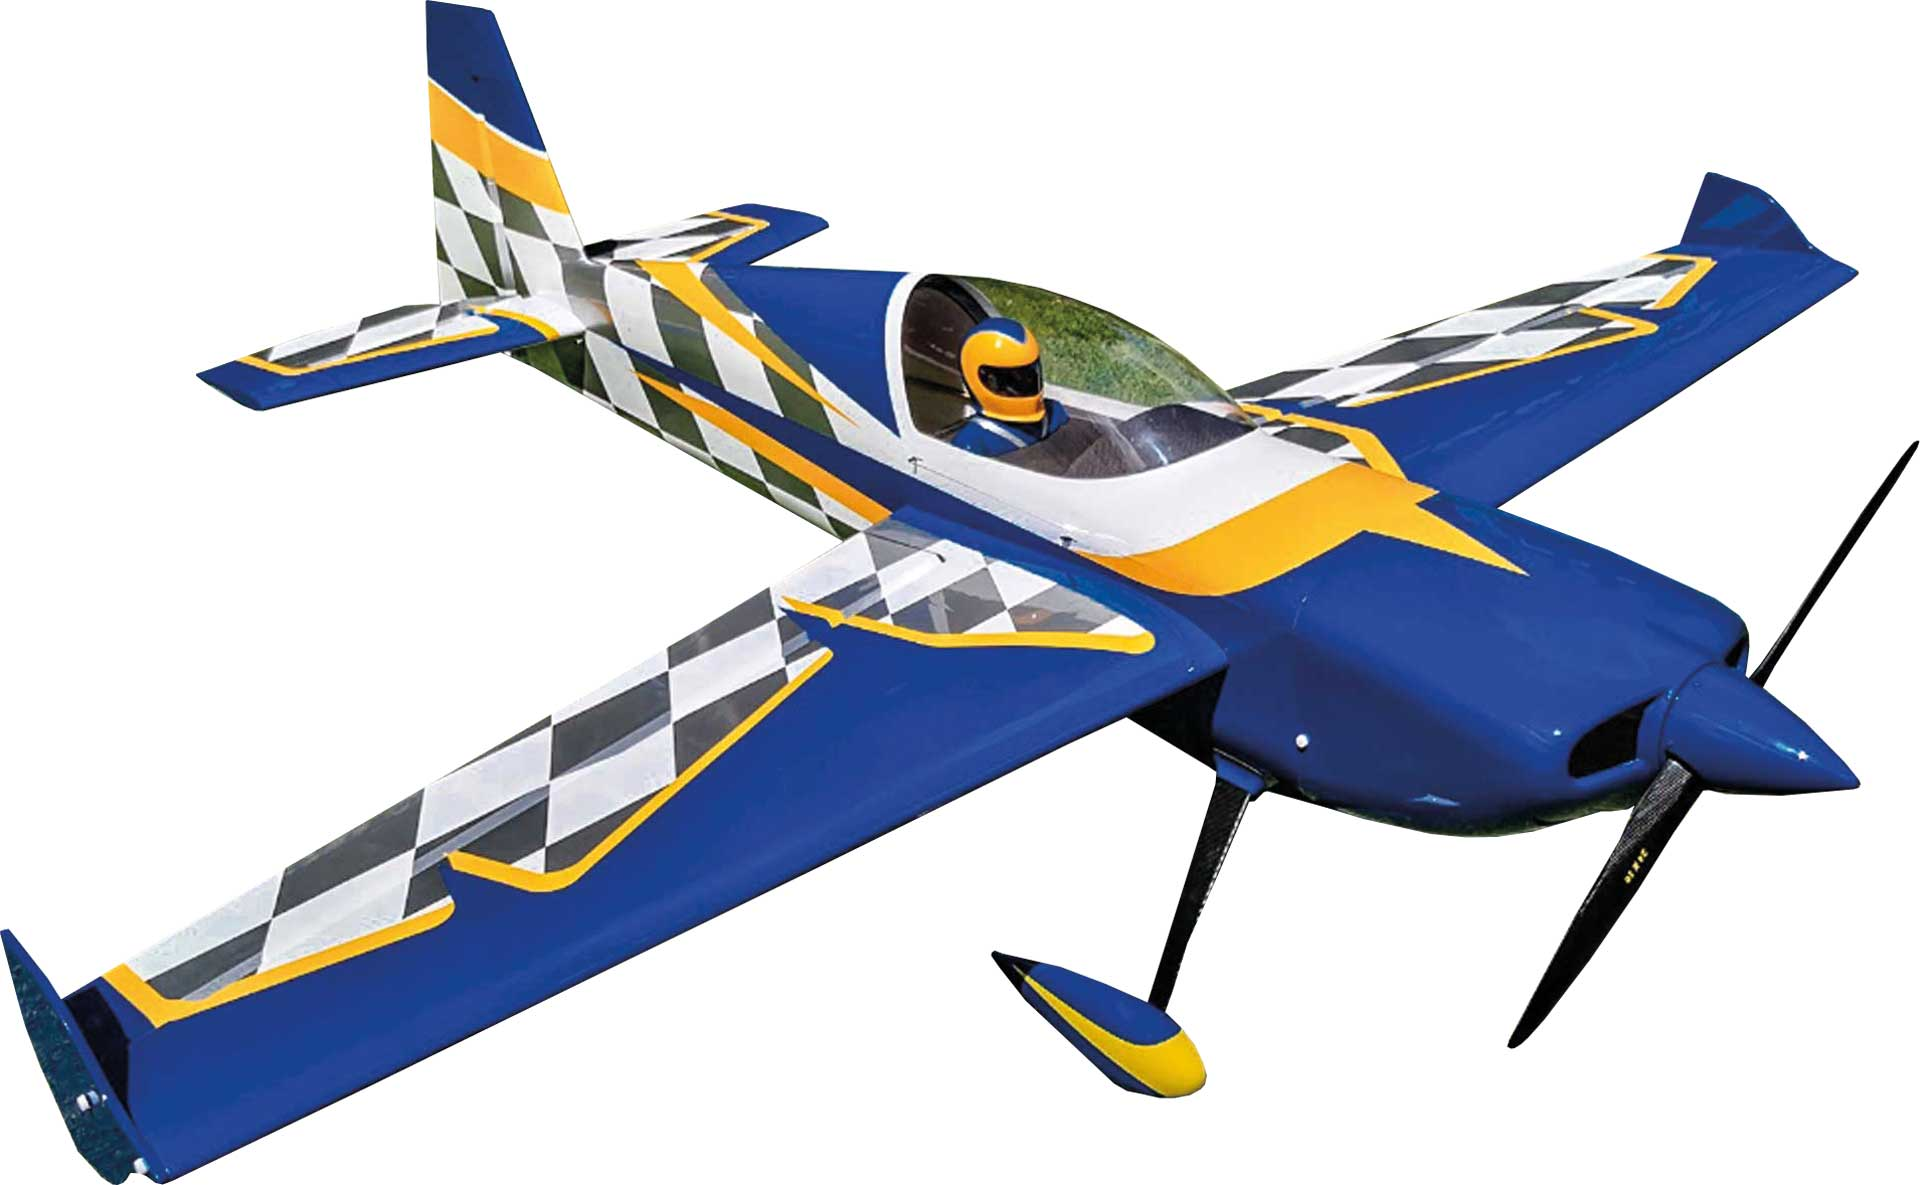 "EXTREMEFLIGHT-RC SLICK 114"" Blau/Weiss ARF"